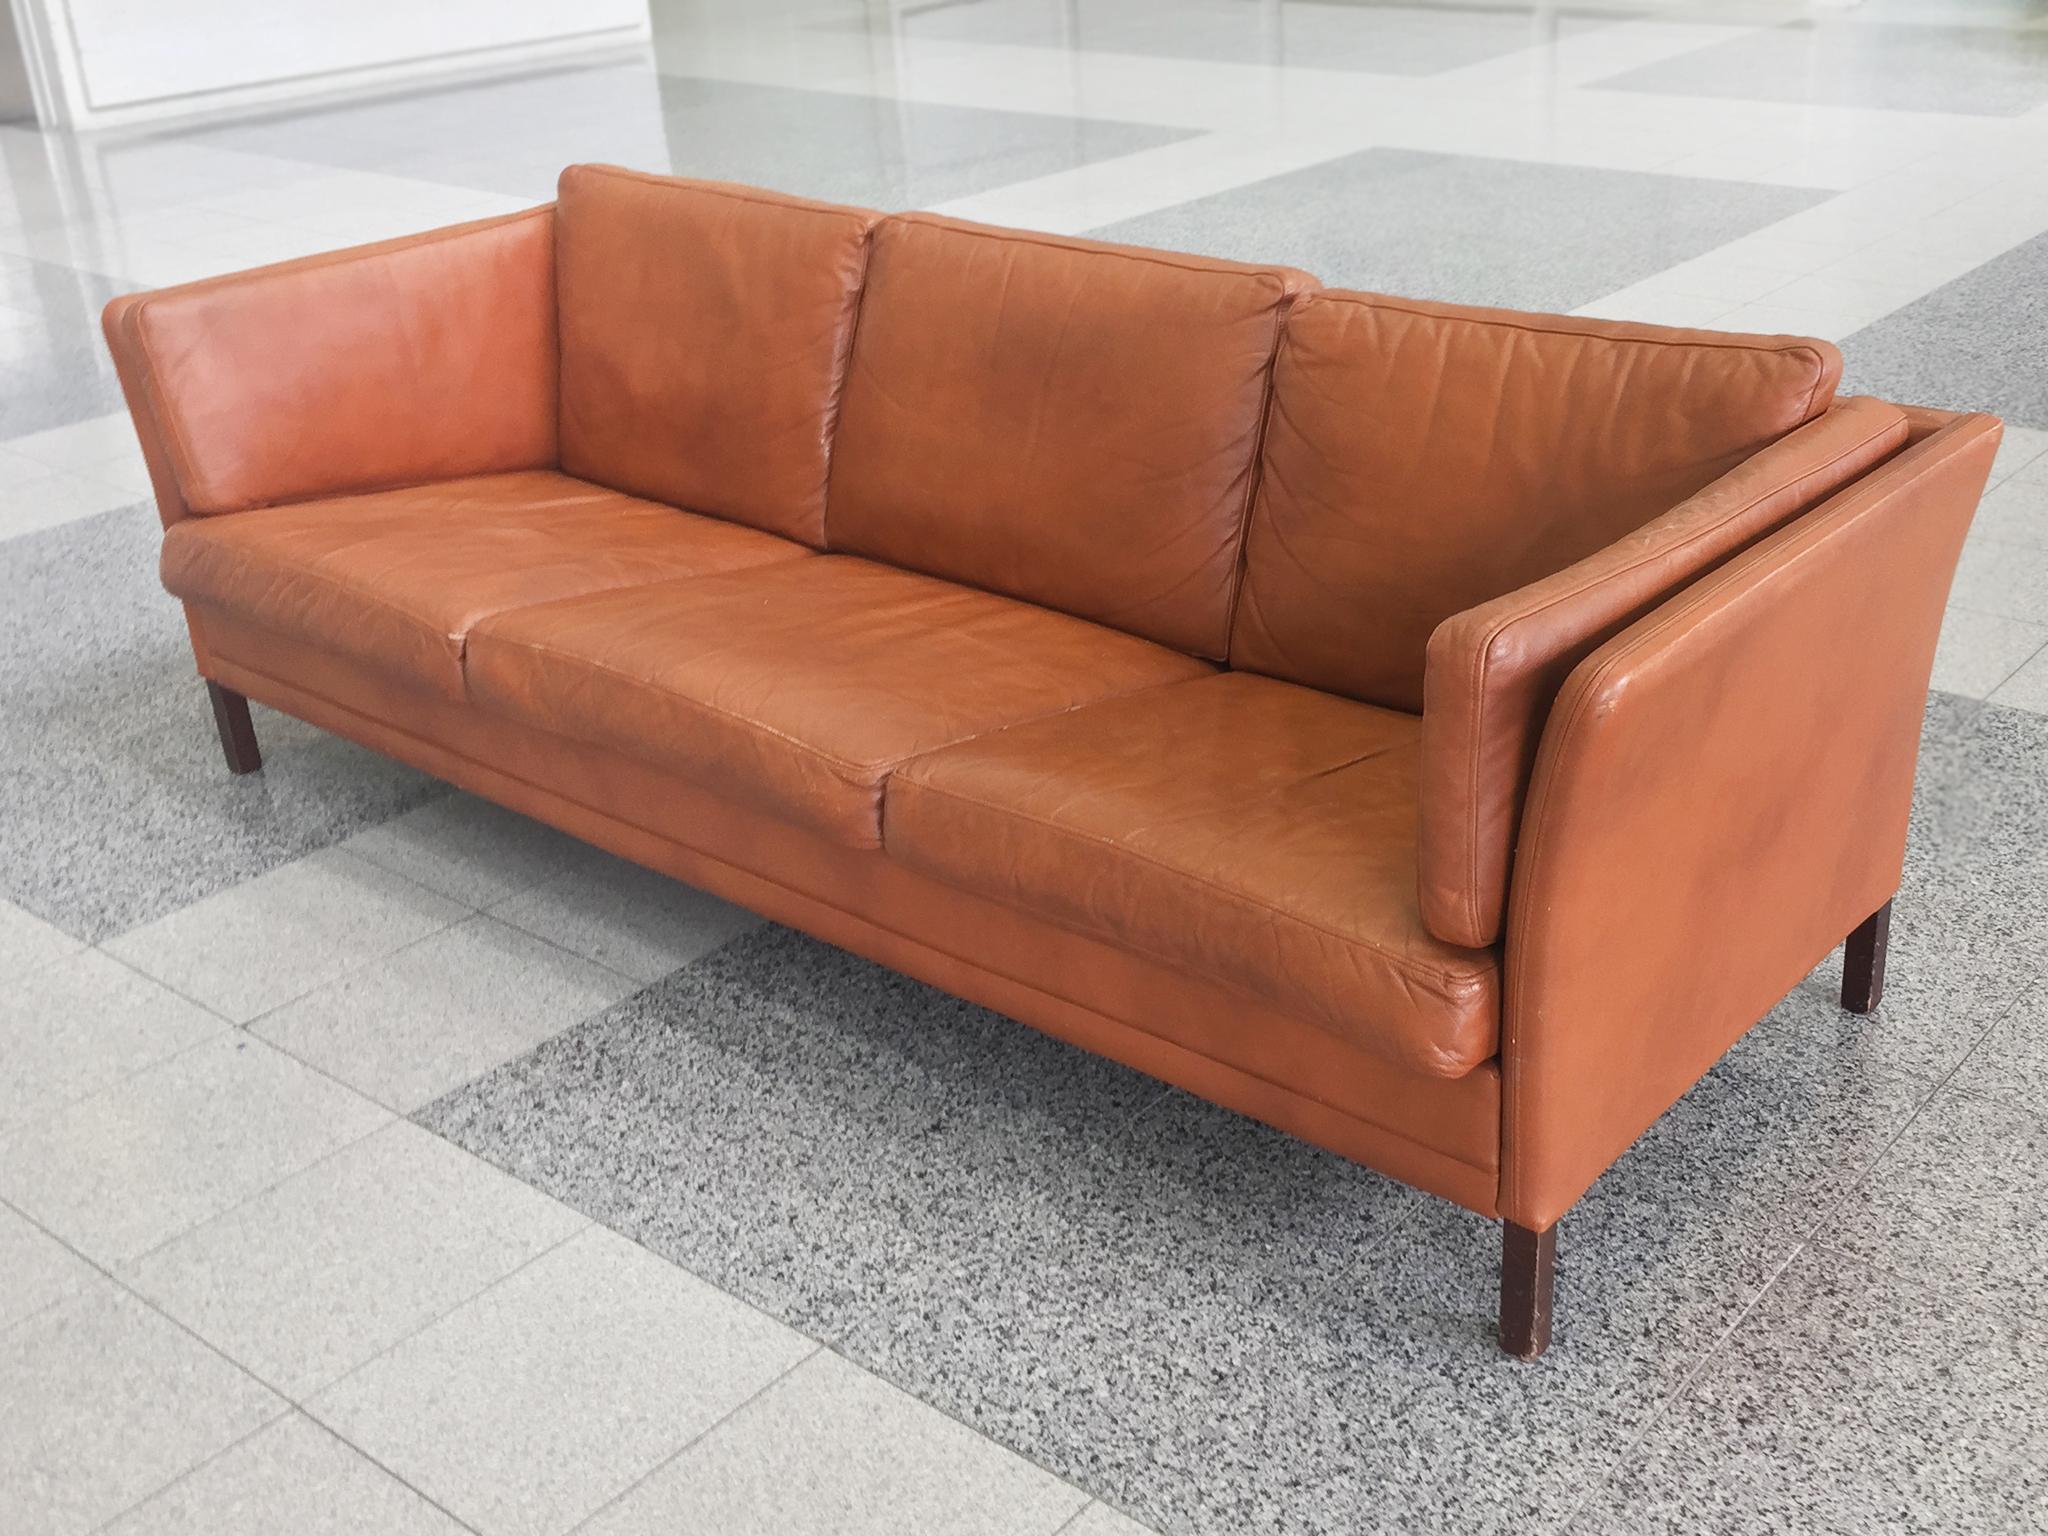 Danish Mid Century Modern Leather Sofa By Mogens Hansen At